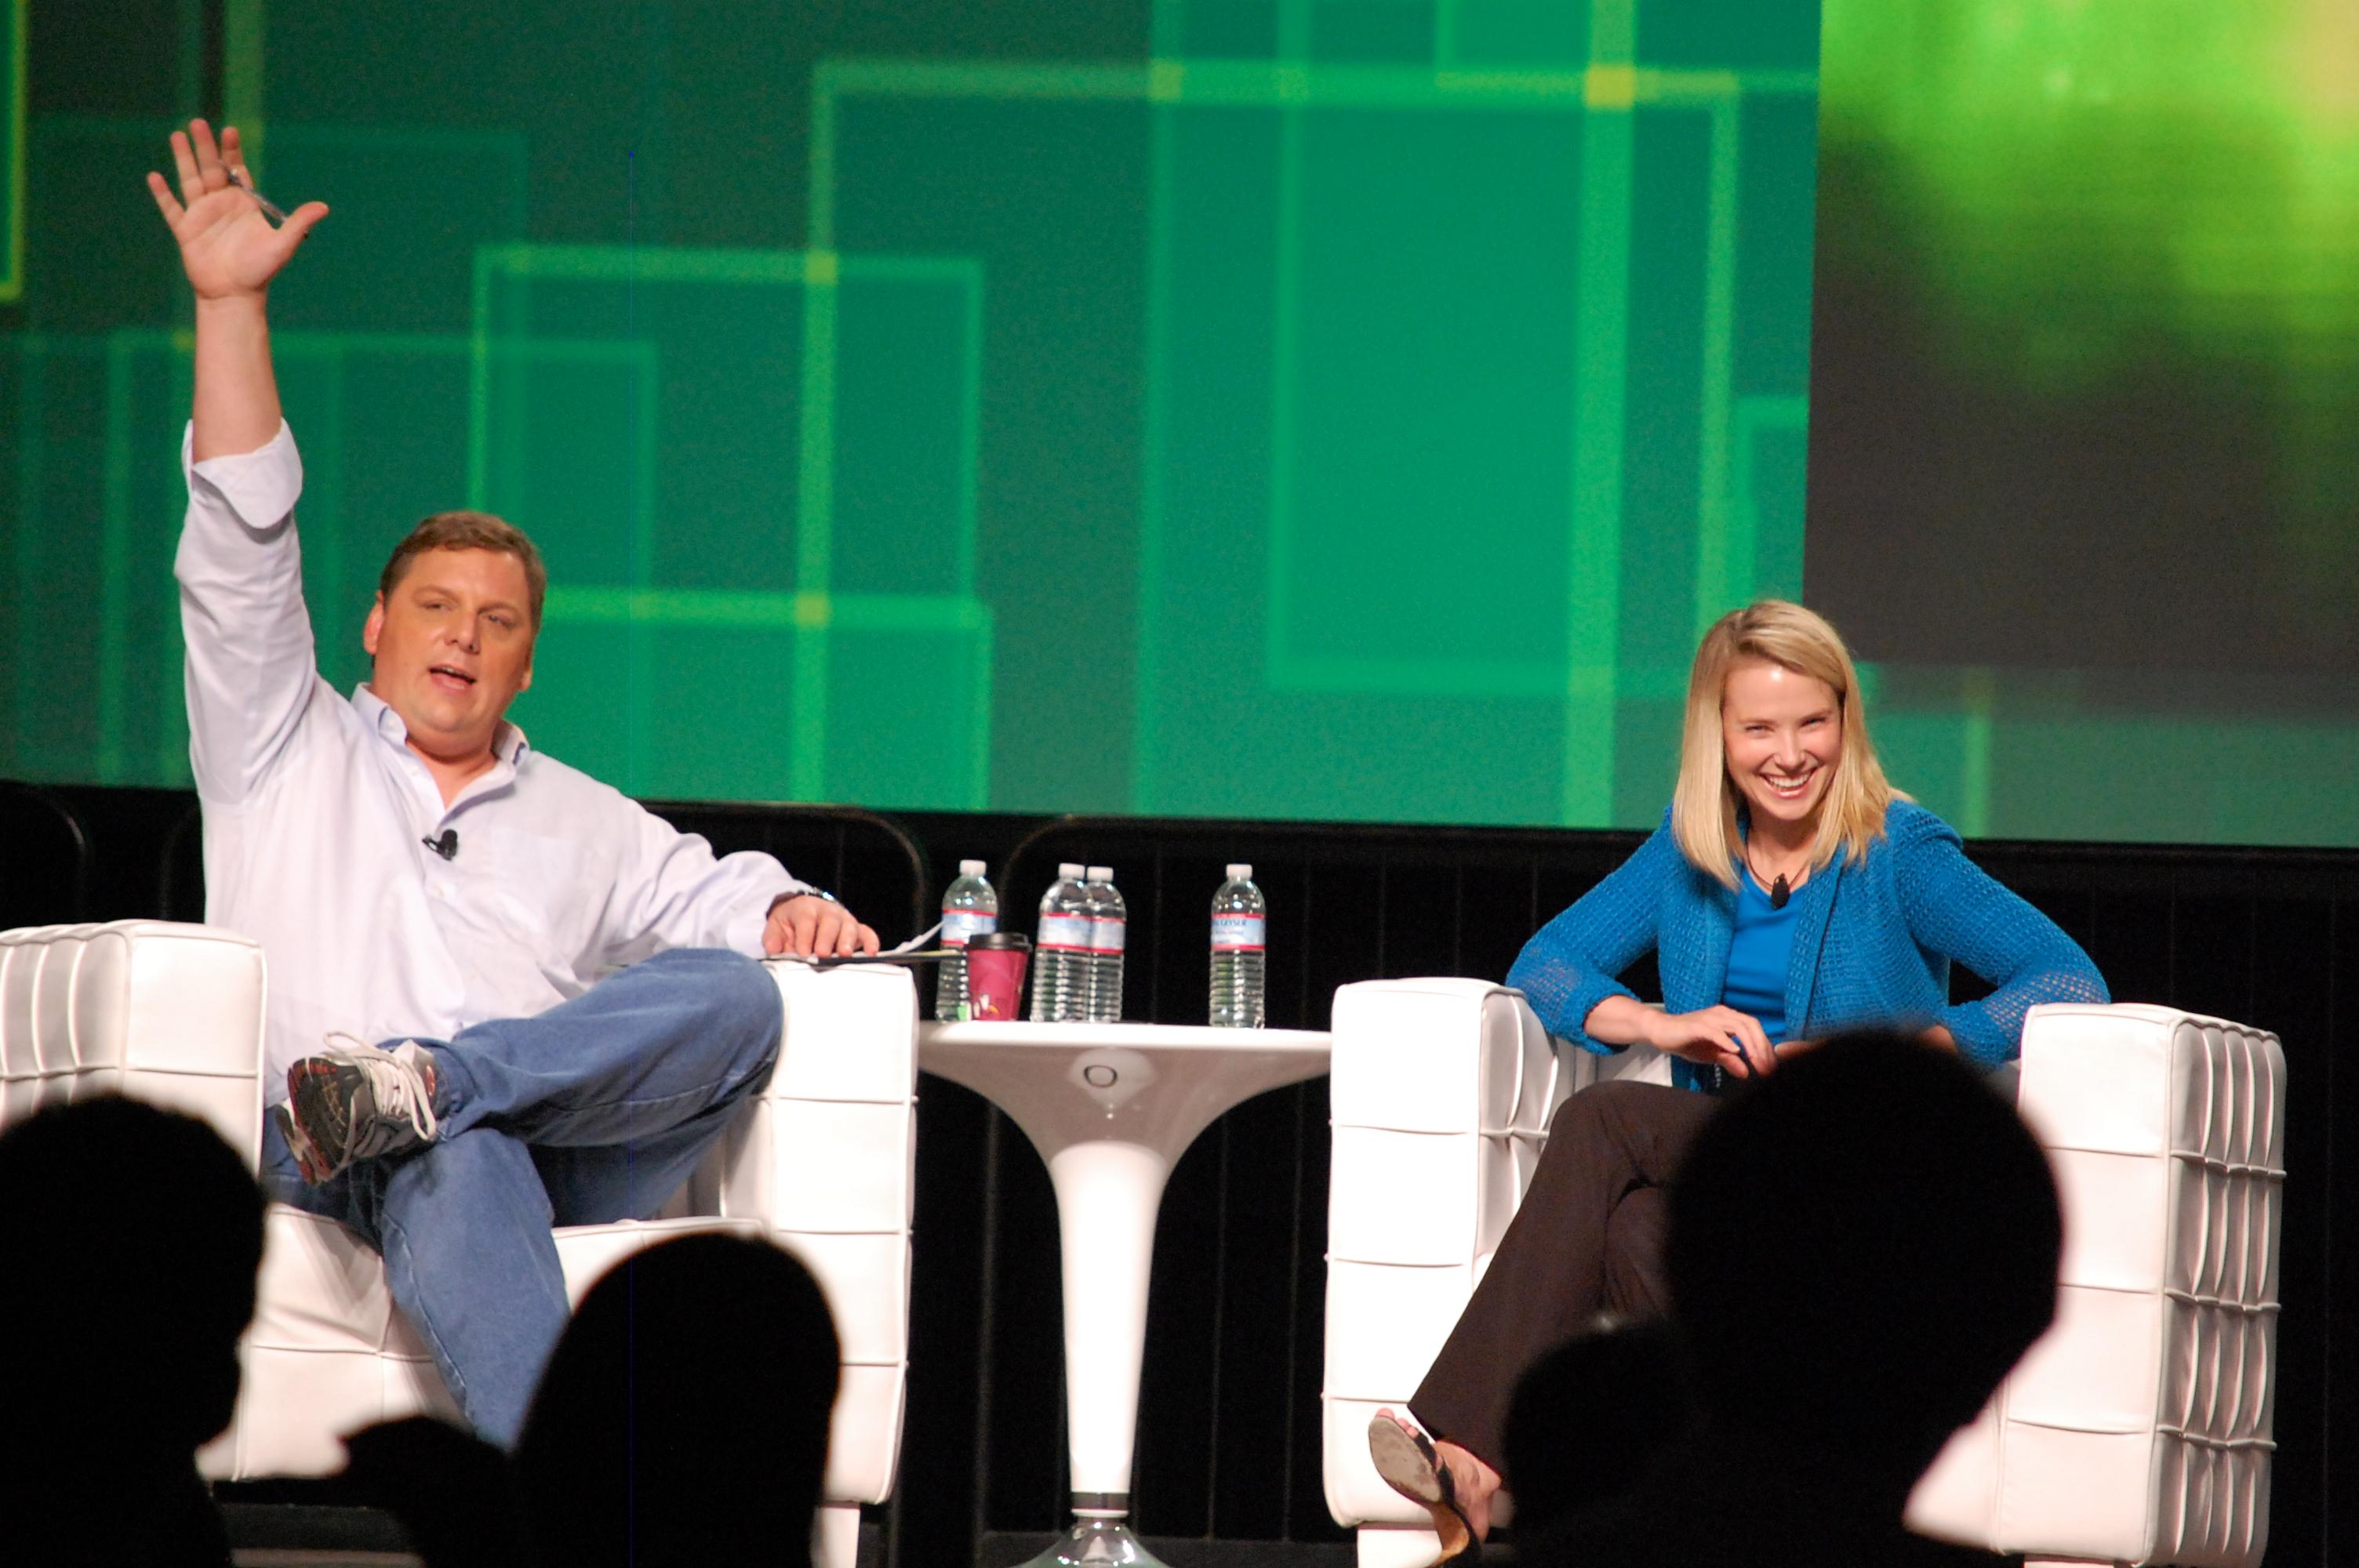 Yahoo! CEO Marissa Meyer with Michael Arrington at TechCrunch Disrupt